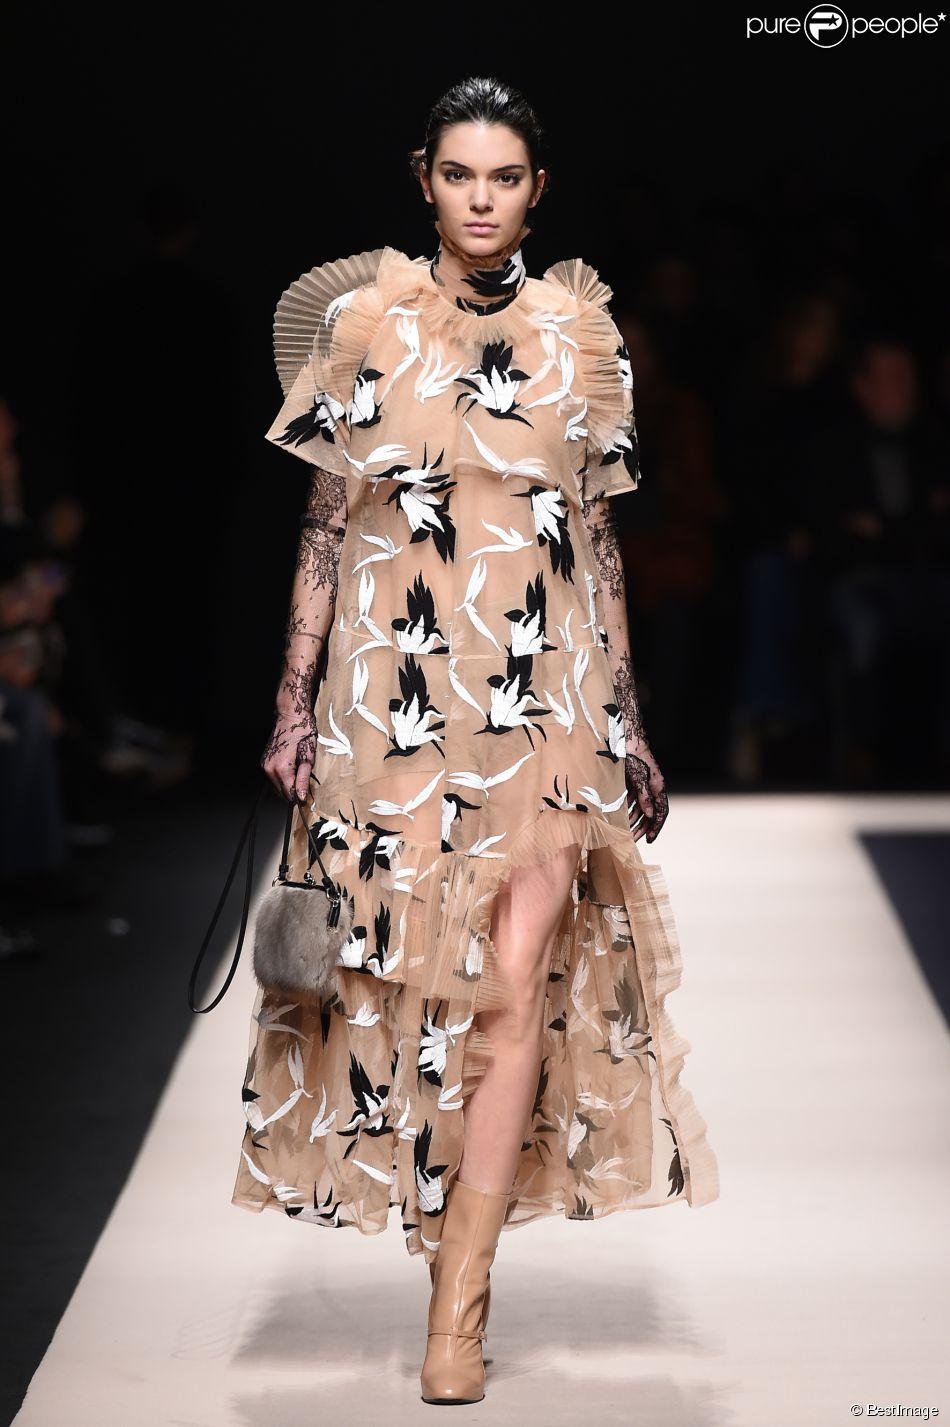 Fashion Week Kendall Jenner Brille Sur Les Podiums De Milan